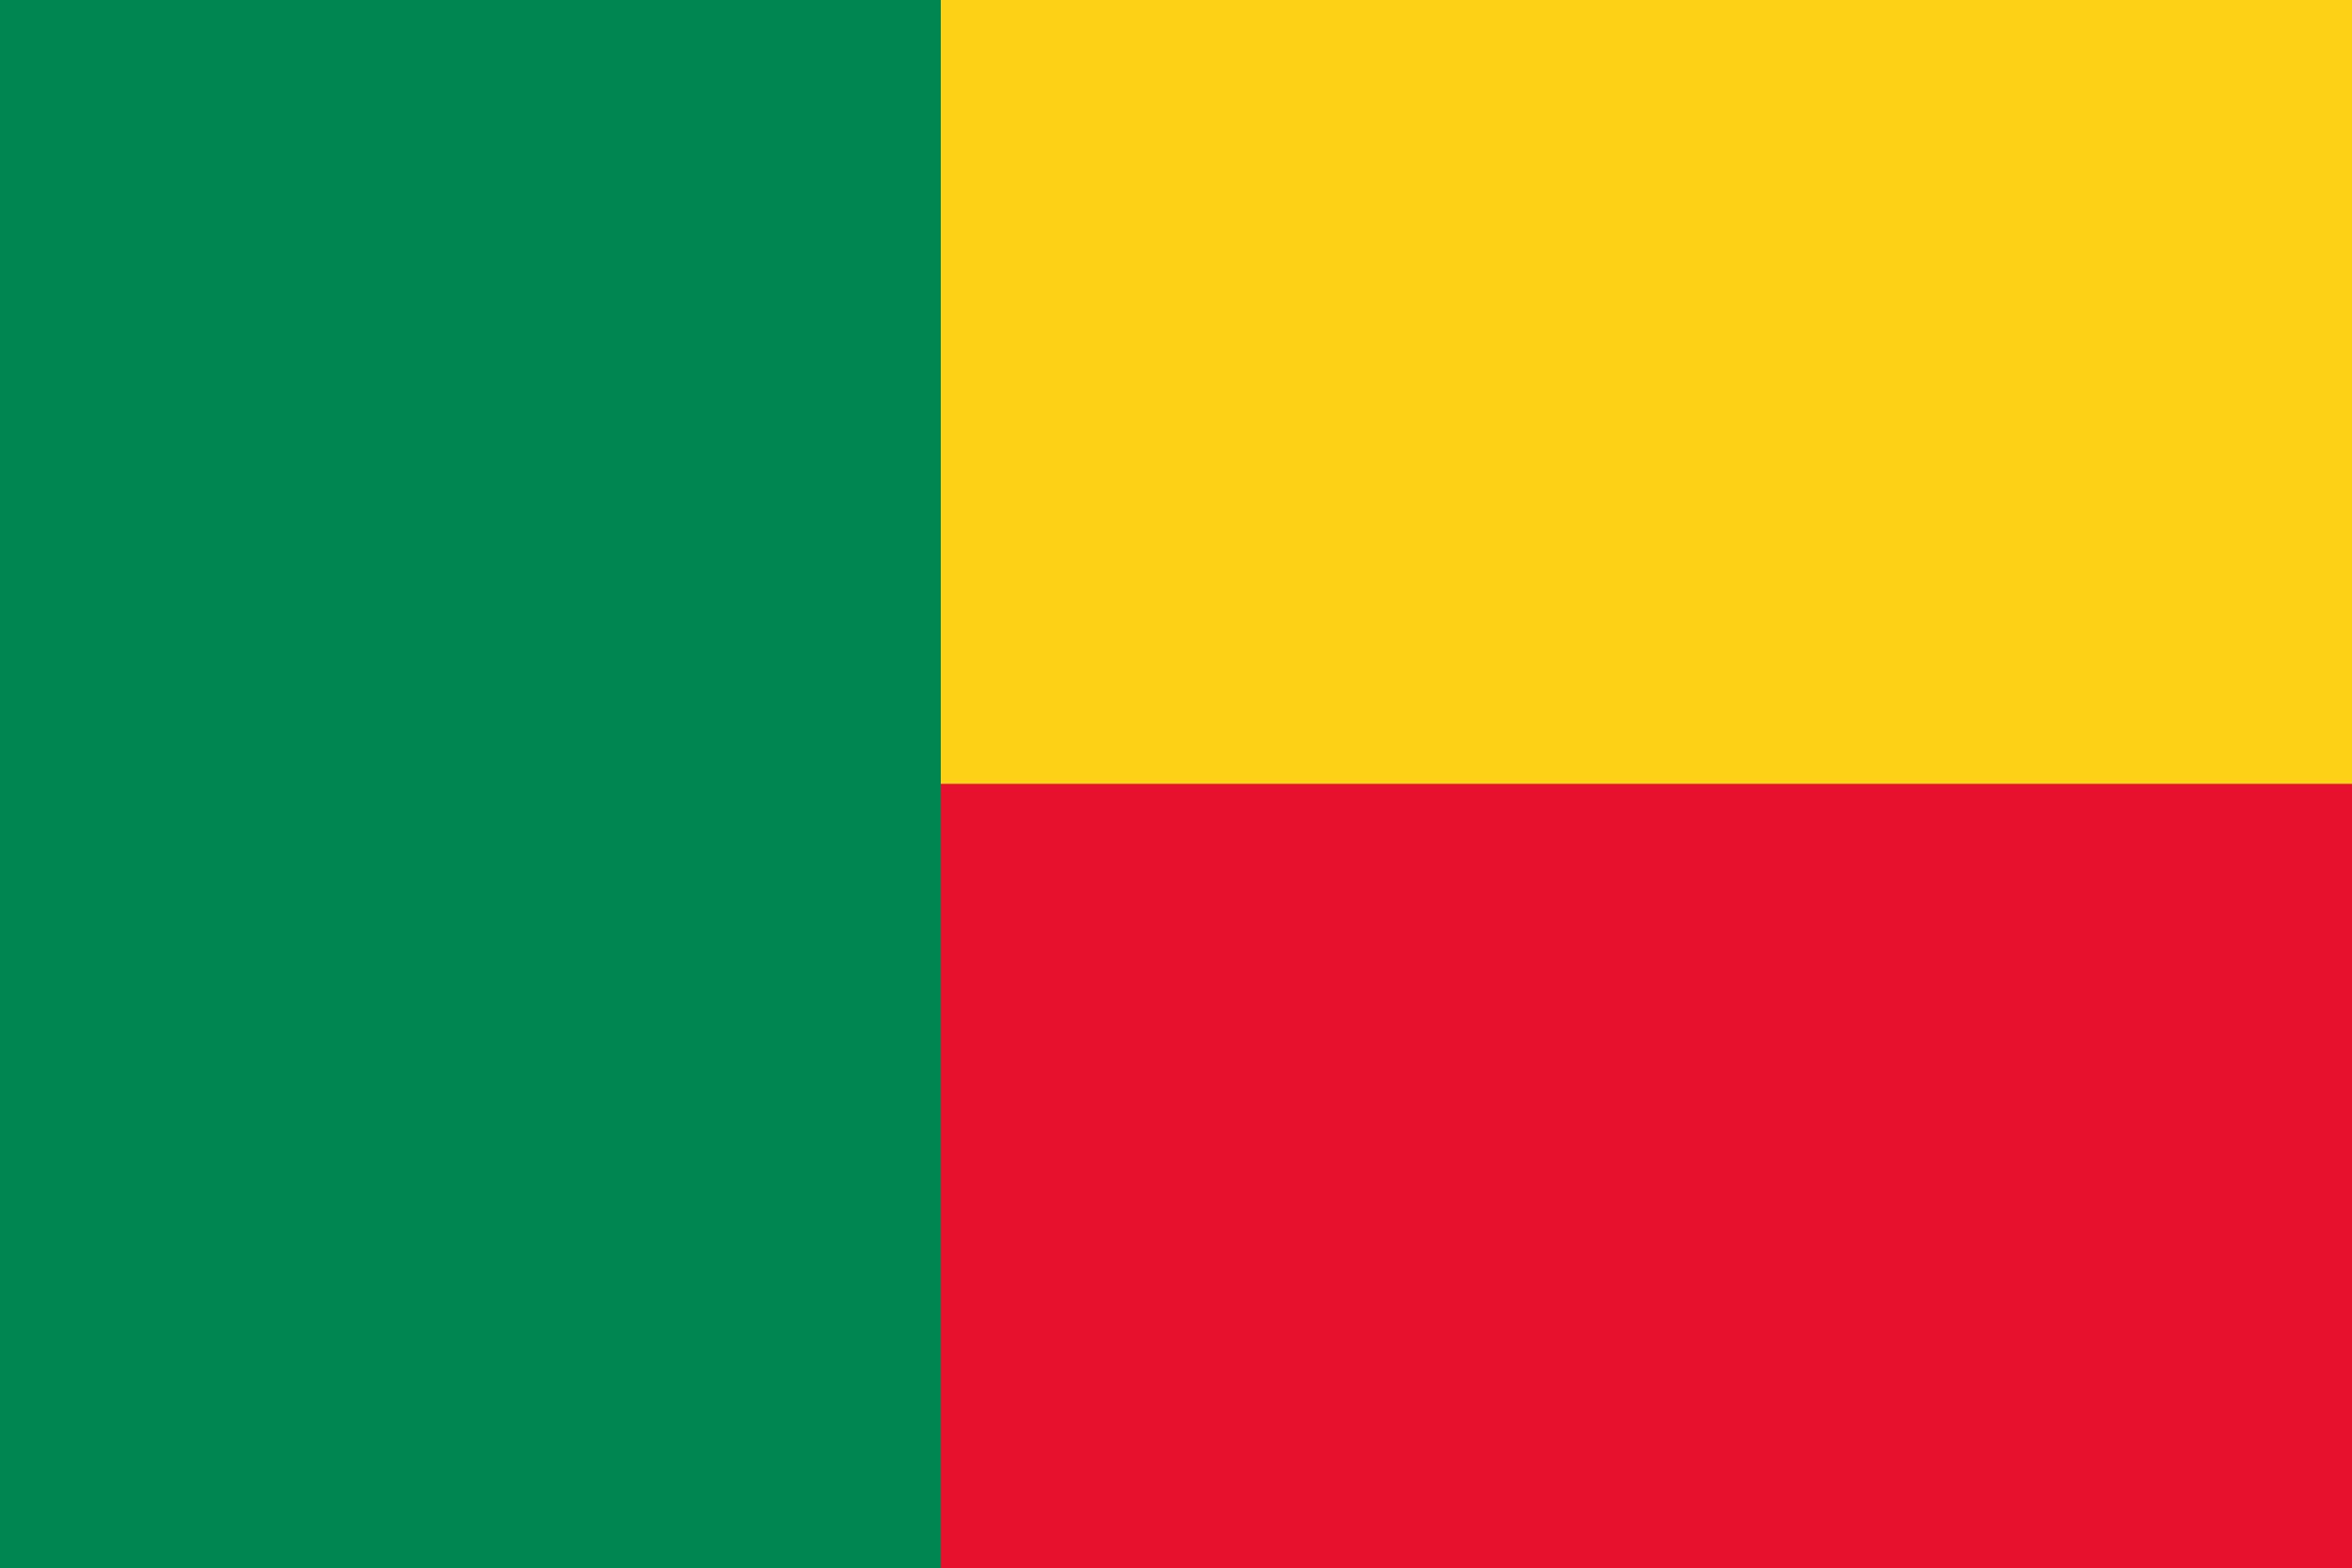 benín, देश, emblema, लोग�प्रतीकbolo - HD वॉलपेपर - प्रोफेसर-falken.com